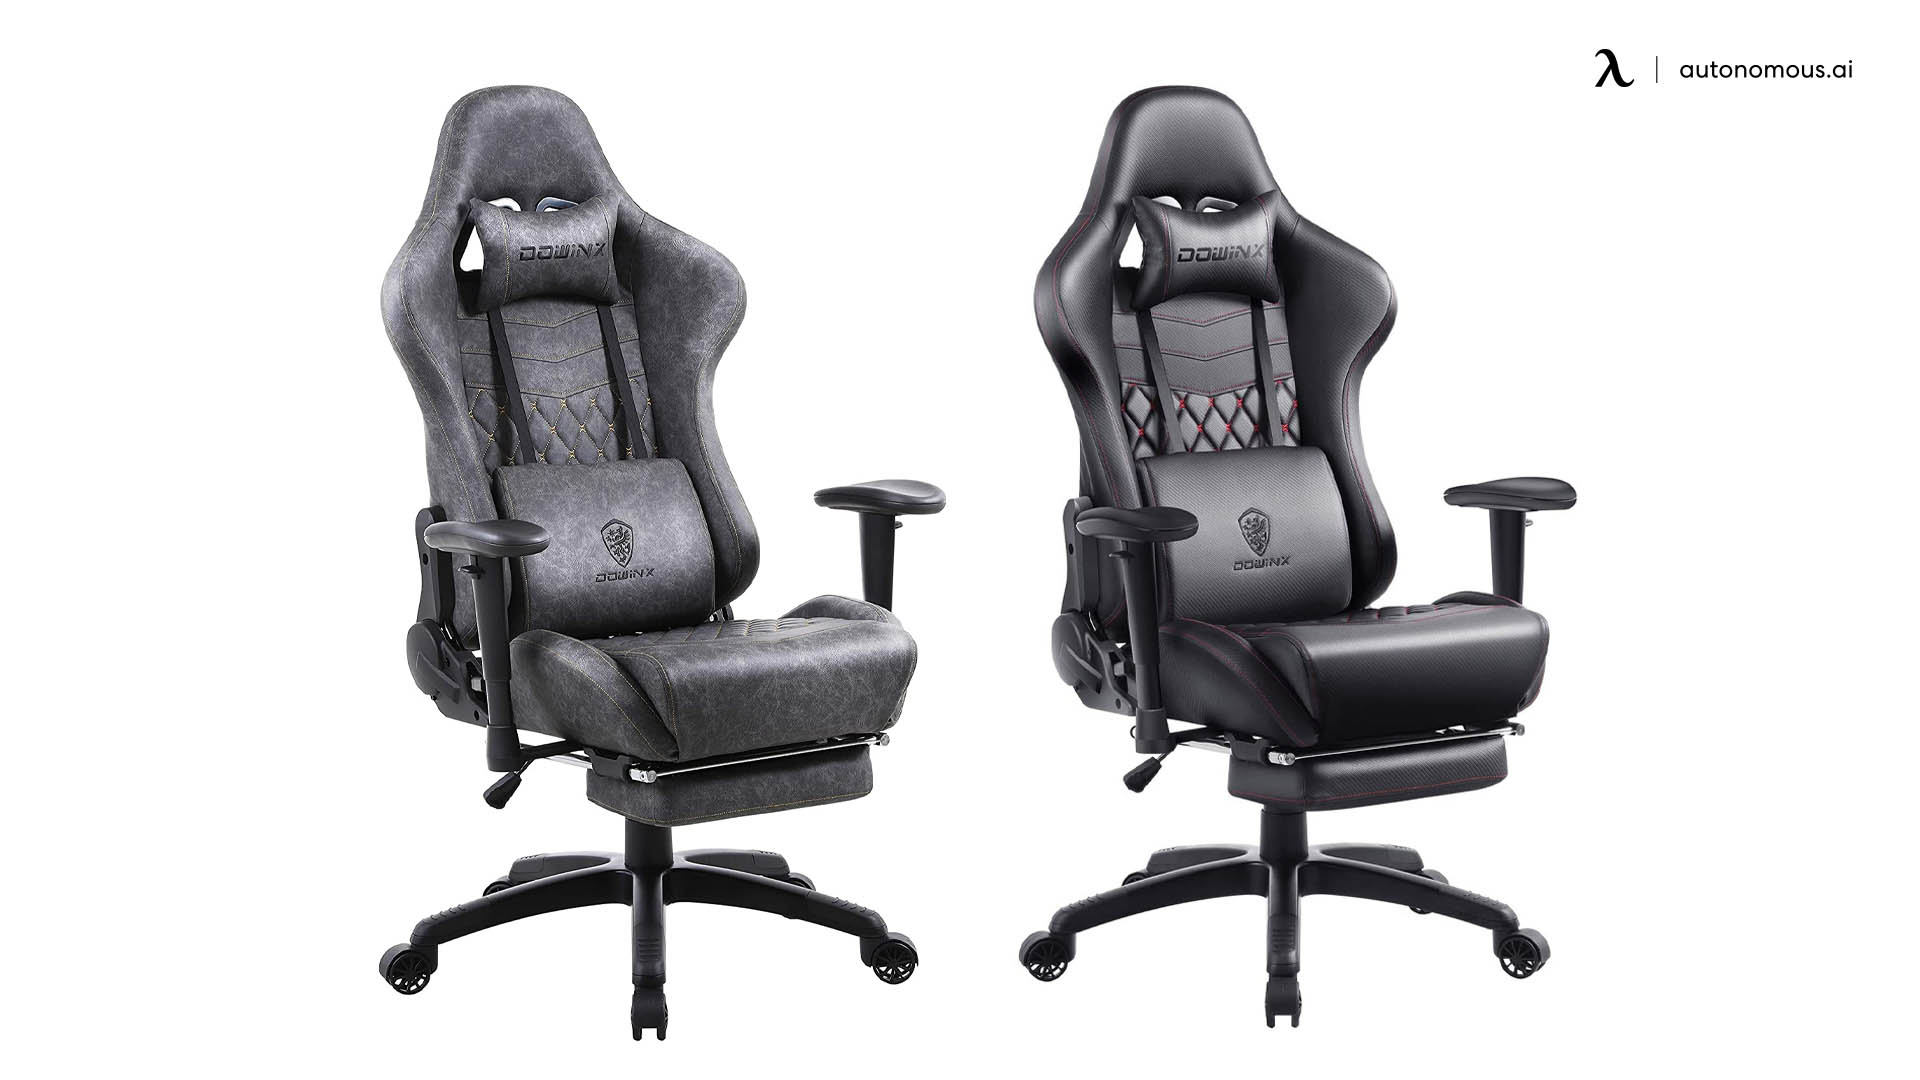 Dowinx Chair Office Chair